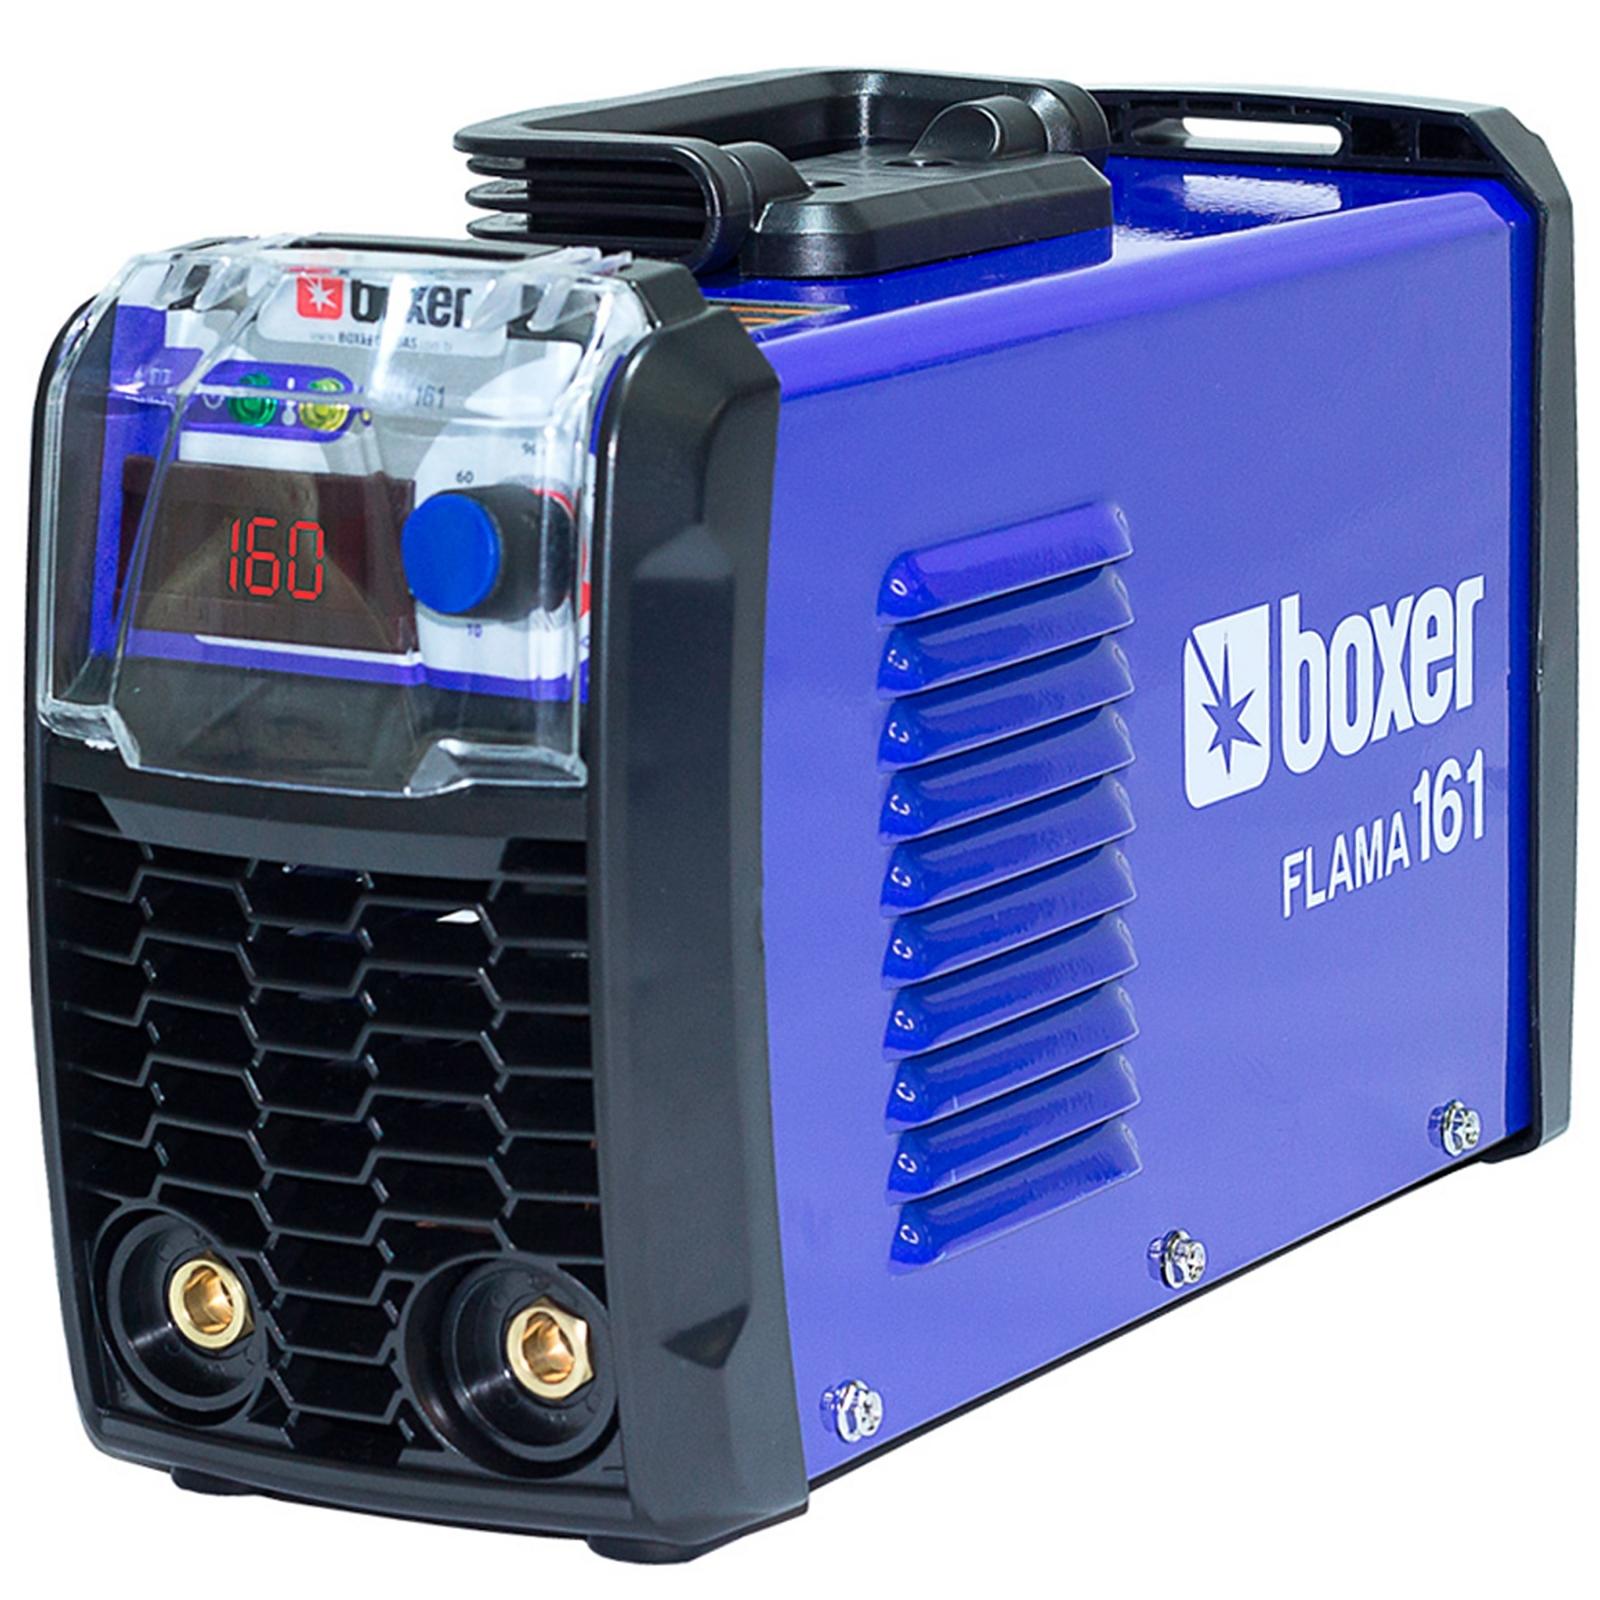 Máquina De Solda Eletrodo Boxer Flama 161 Bivolt - Ferramentas MEP